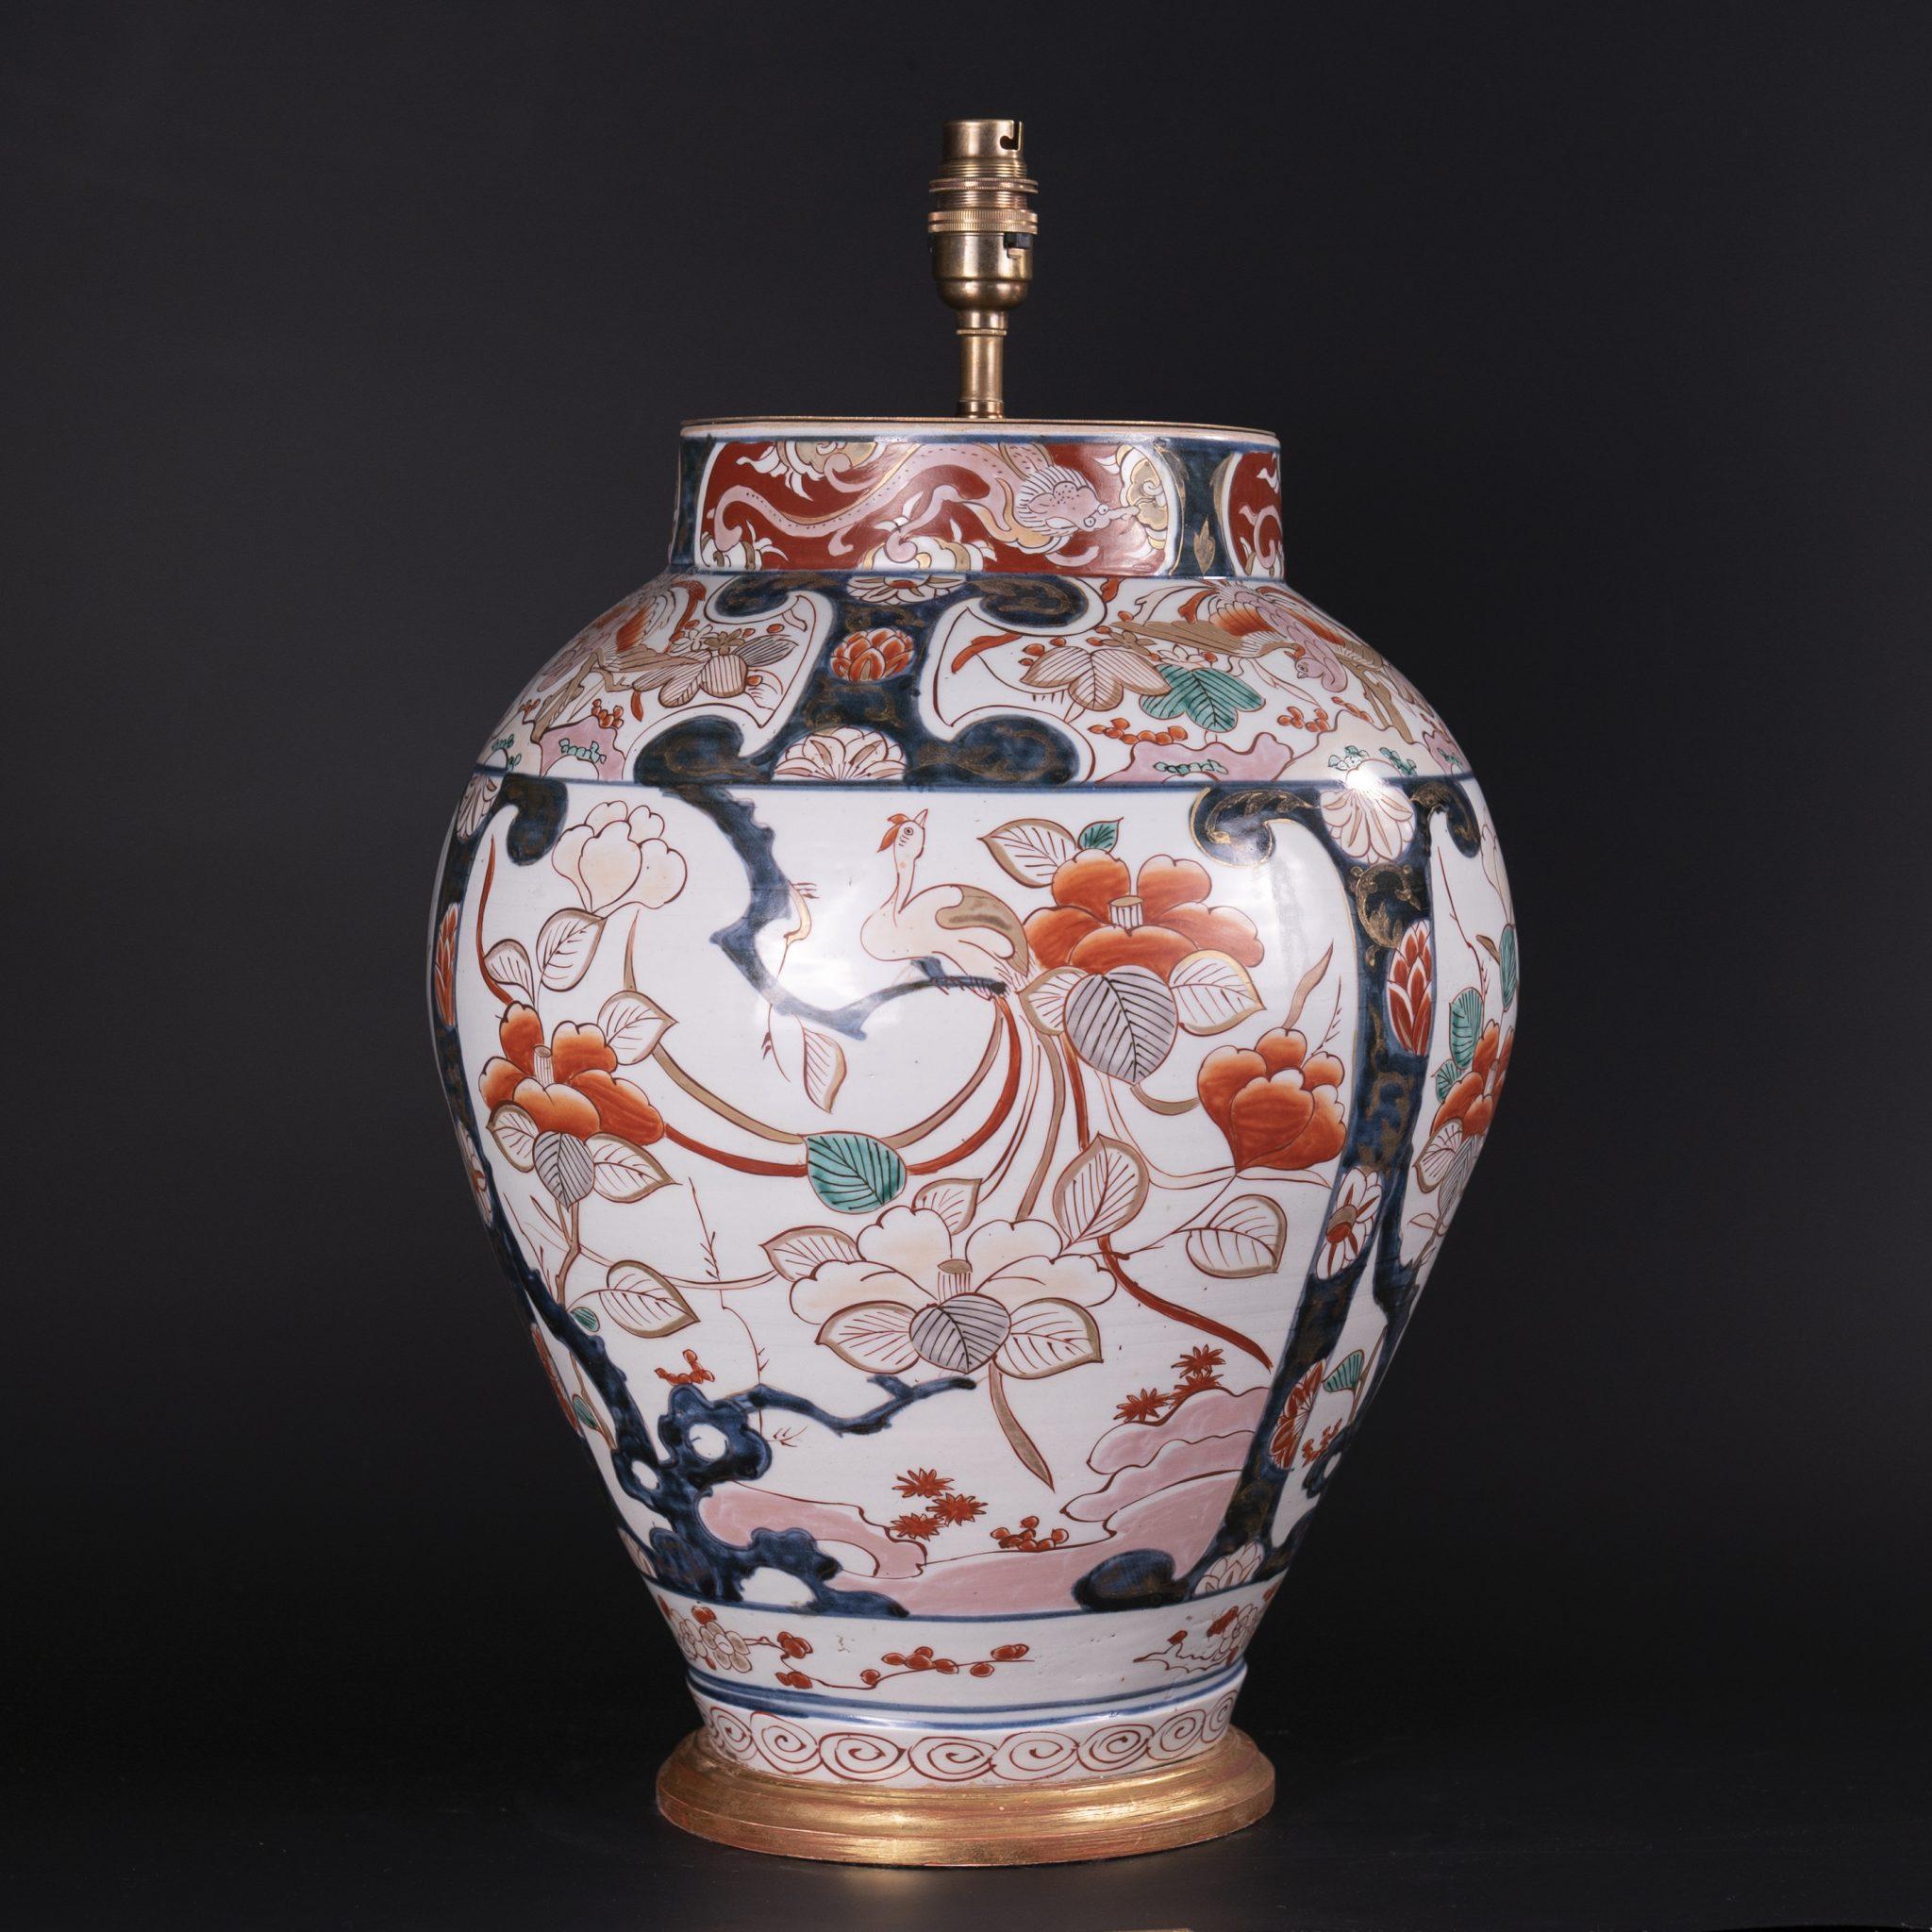 Early 18th Century Japanese Imari Porcelain Vase as a Lamp